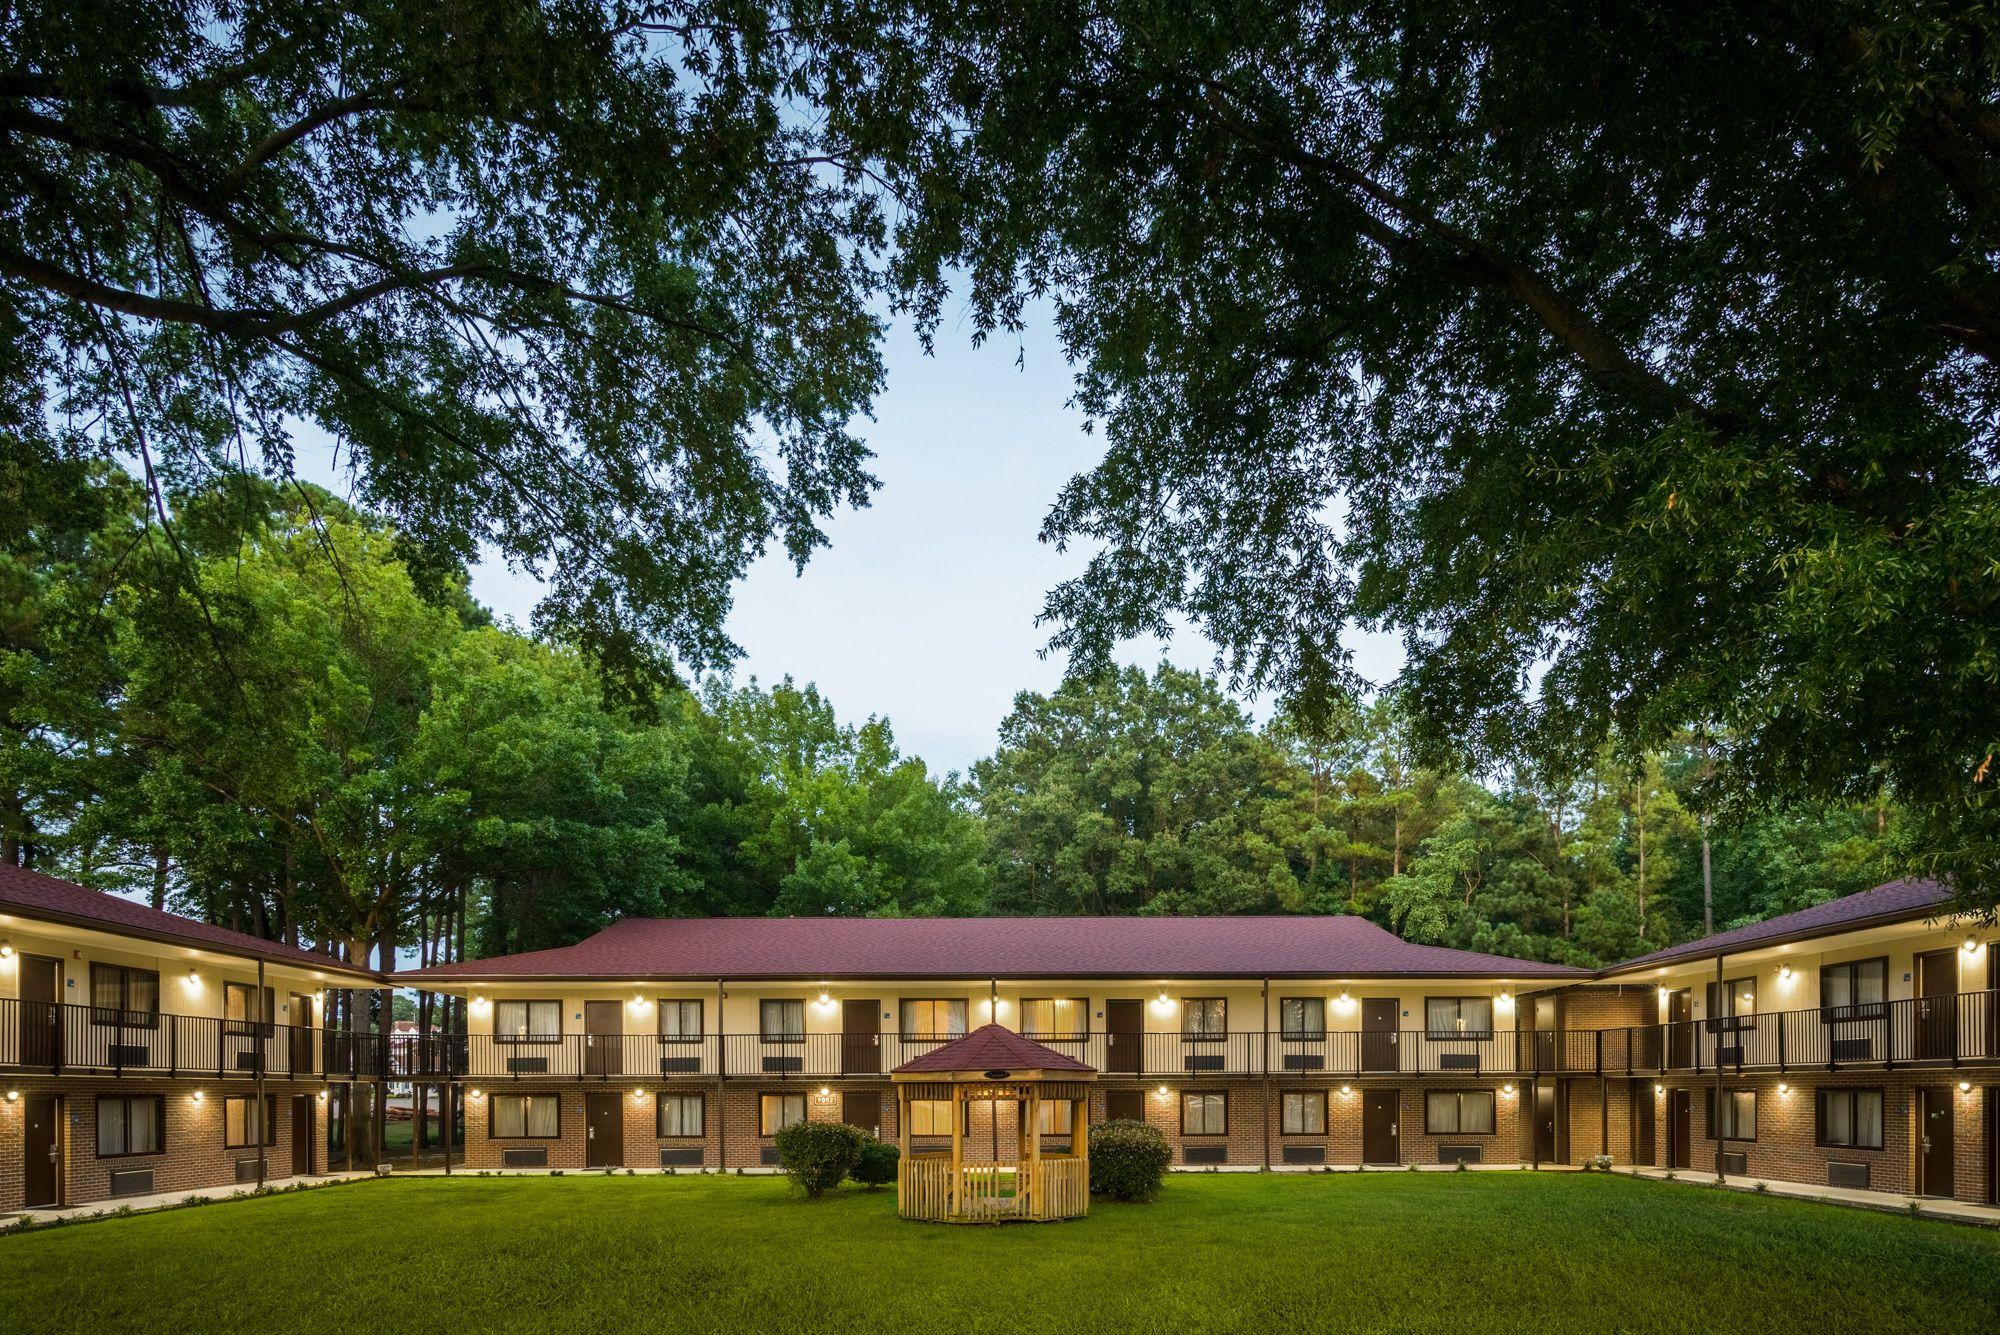 Fort Lee Virginia Army Base >> Ihg Army Hotels Mackintosh Buildings On Fort Lee